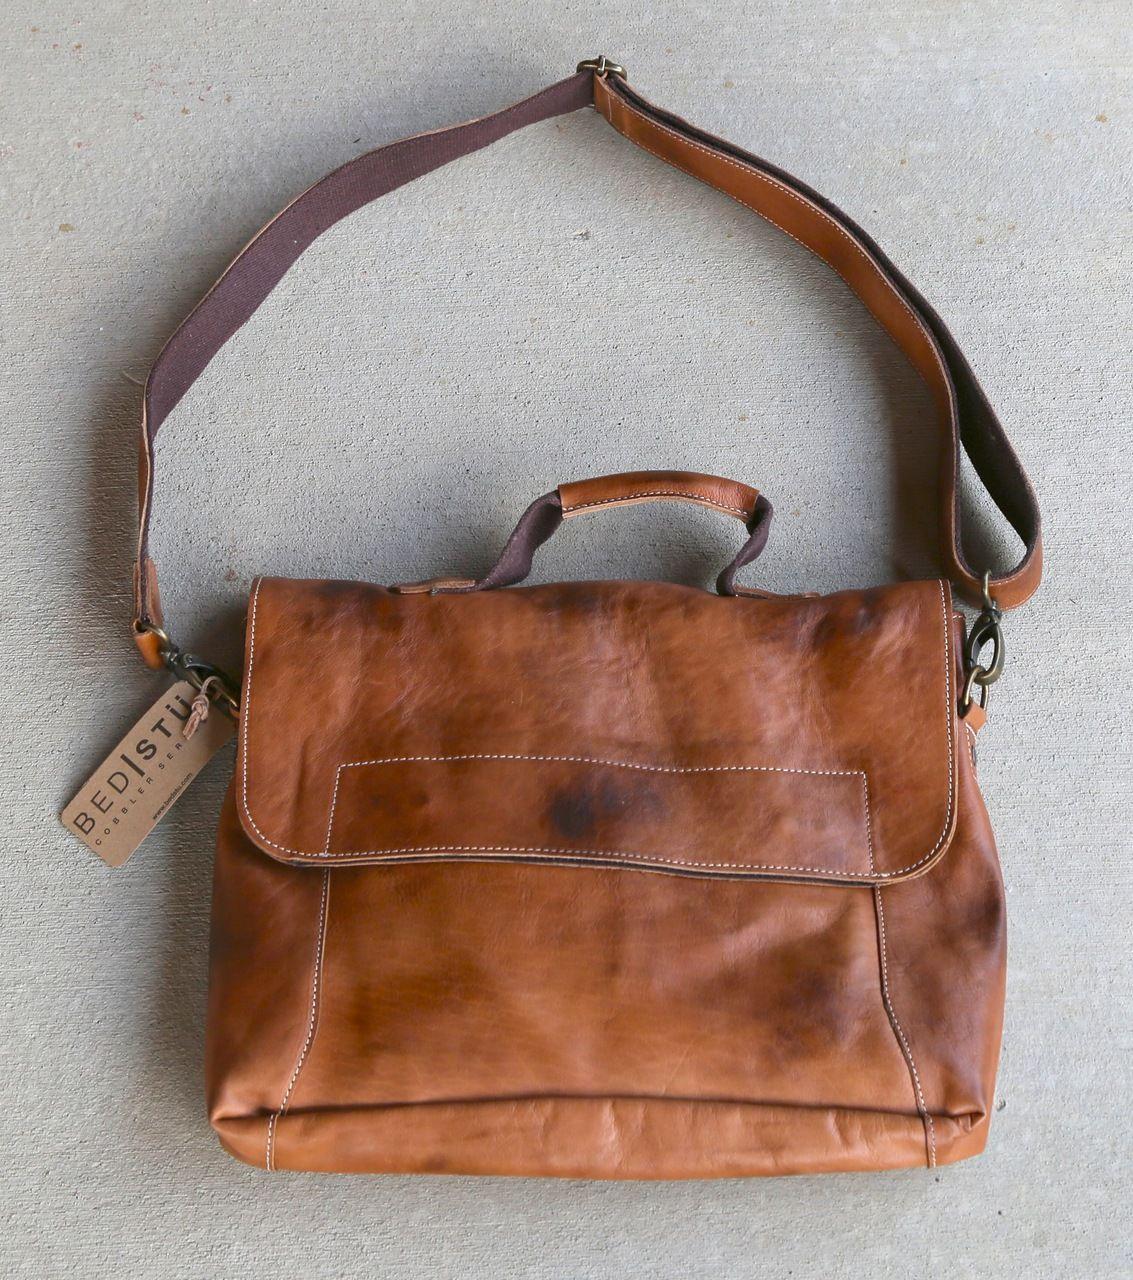 rivertrail mercantile - bed stu hampton tan handbag, $260.00 (http